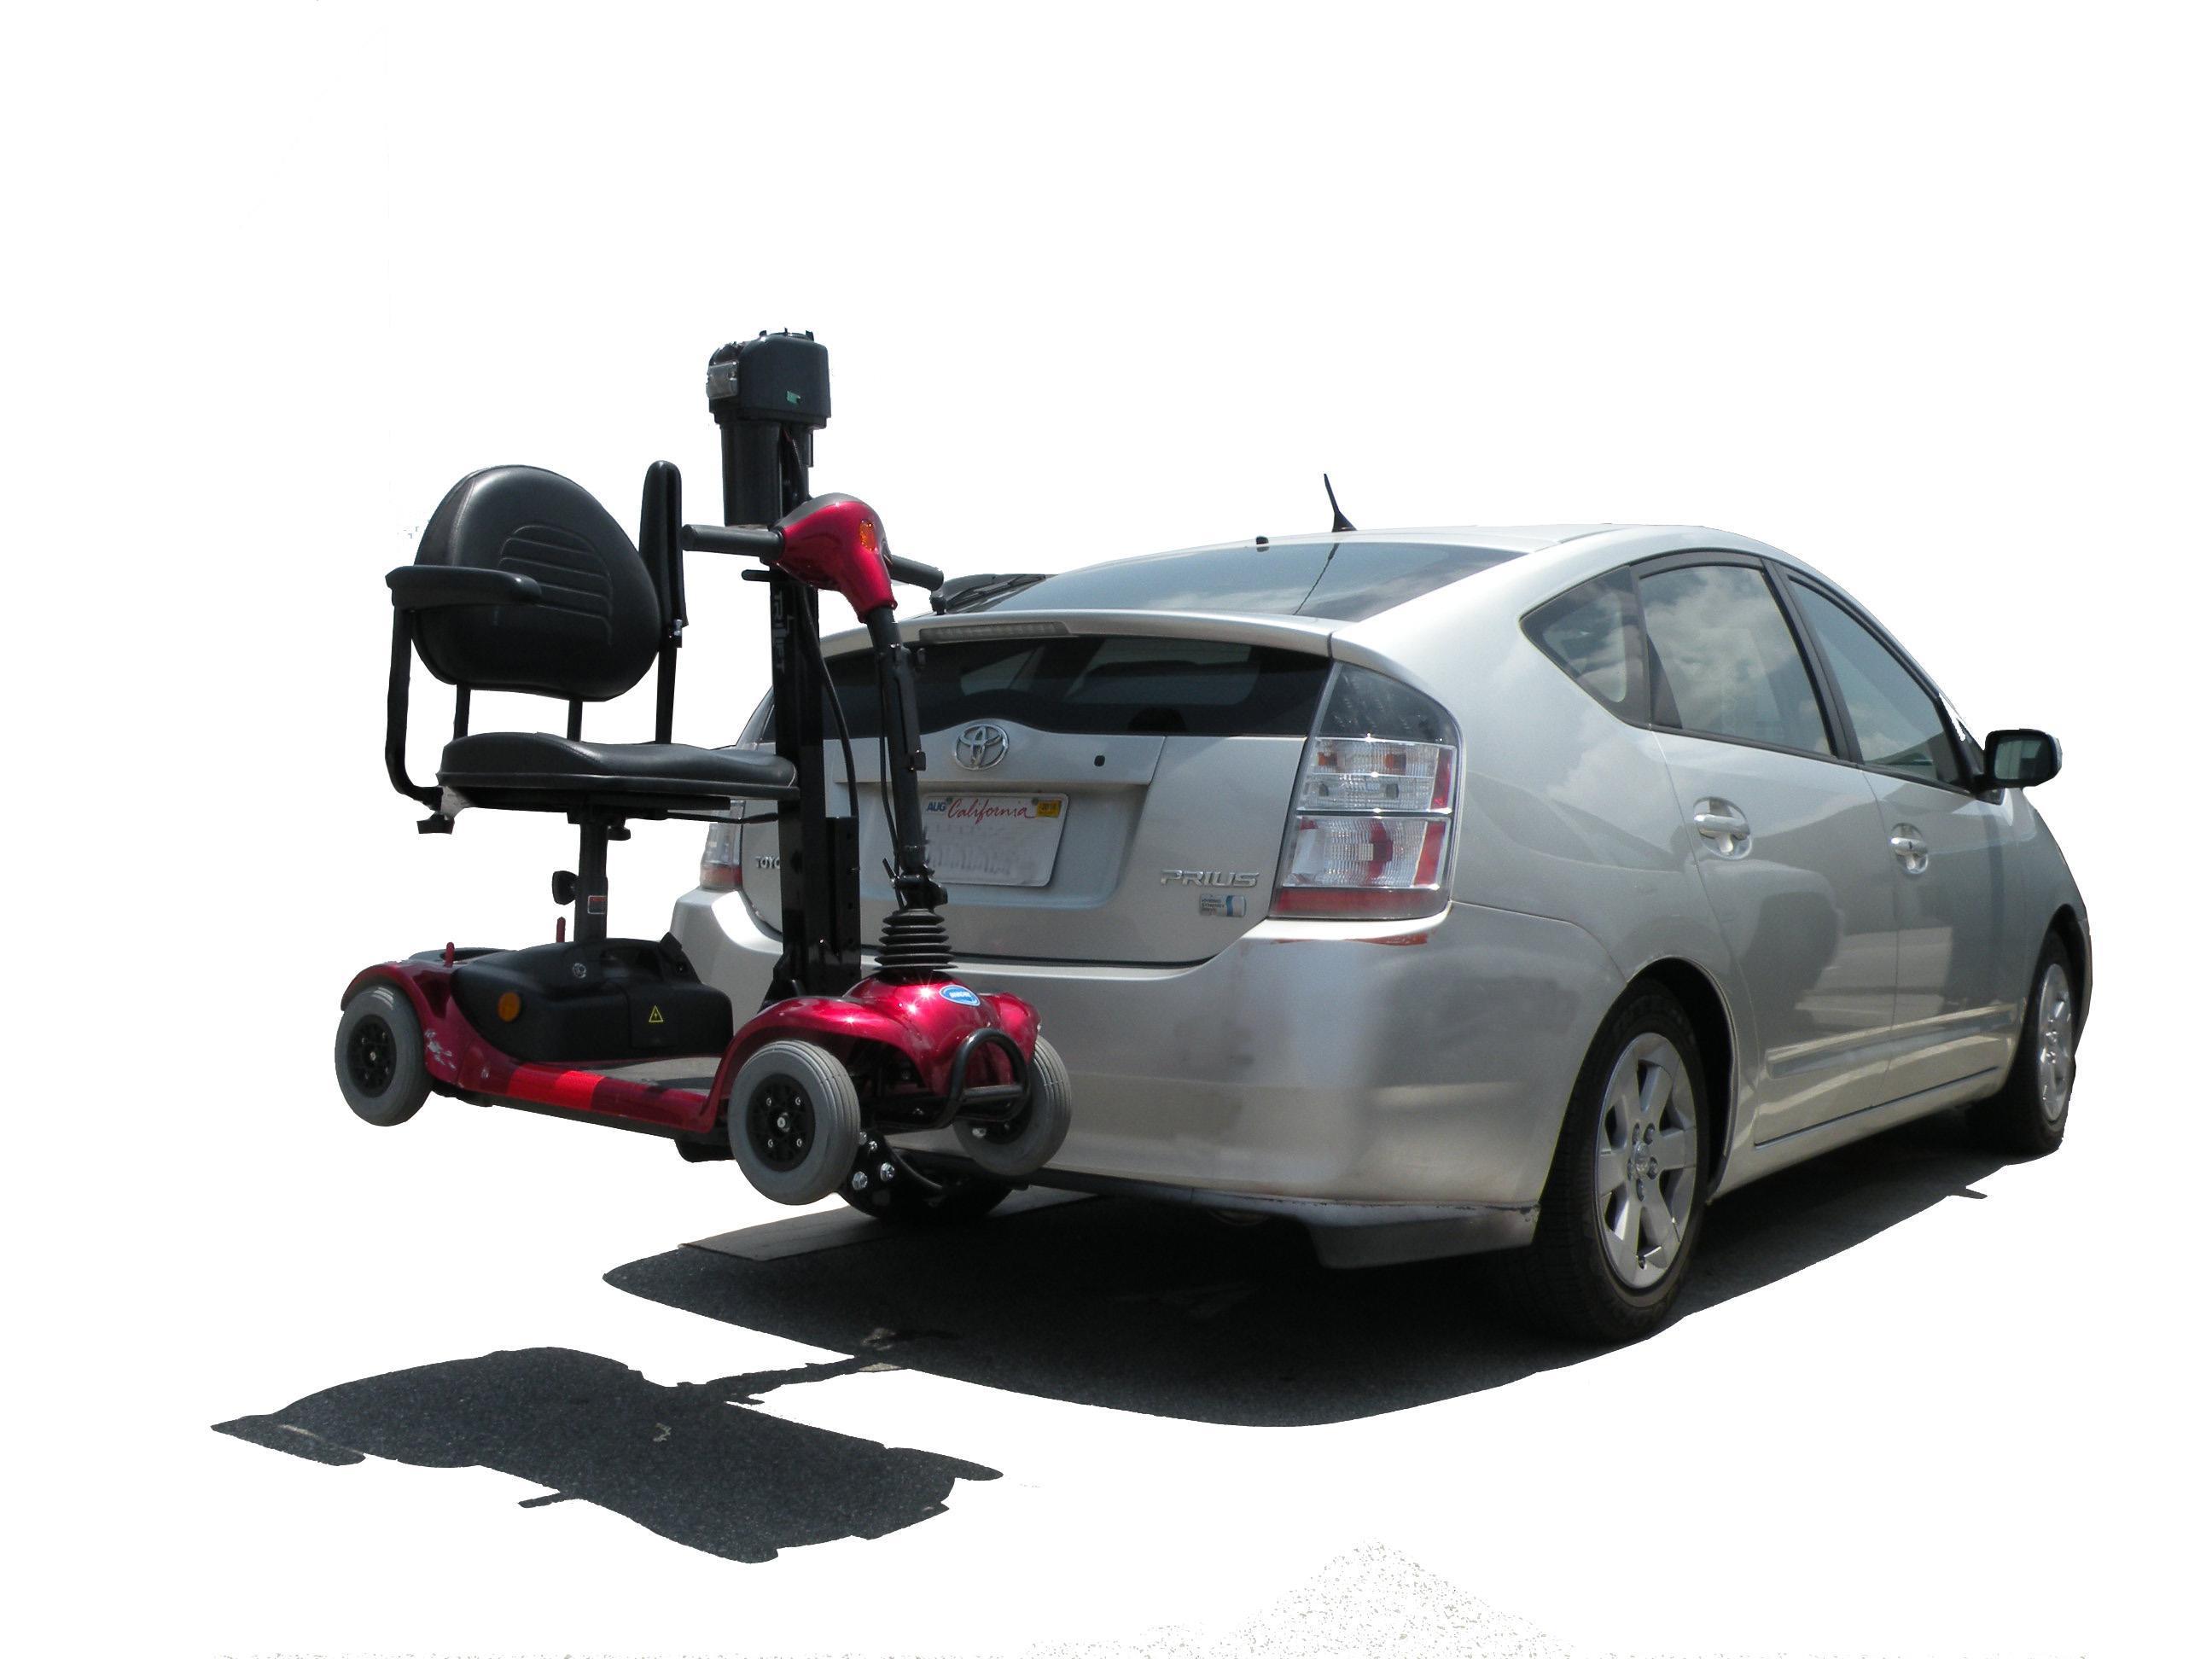 motorized chair lift foam sofa trilift scooter and powerchair